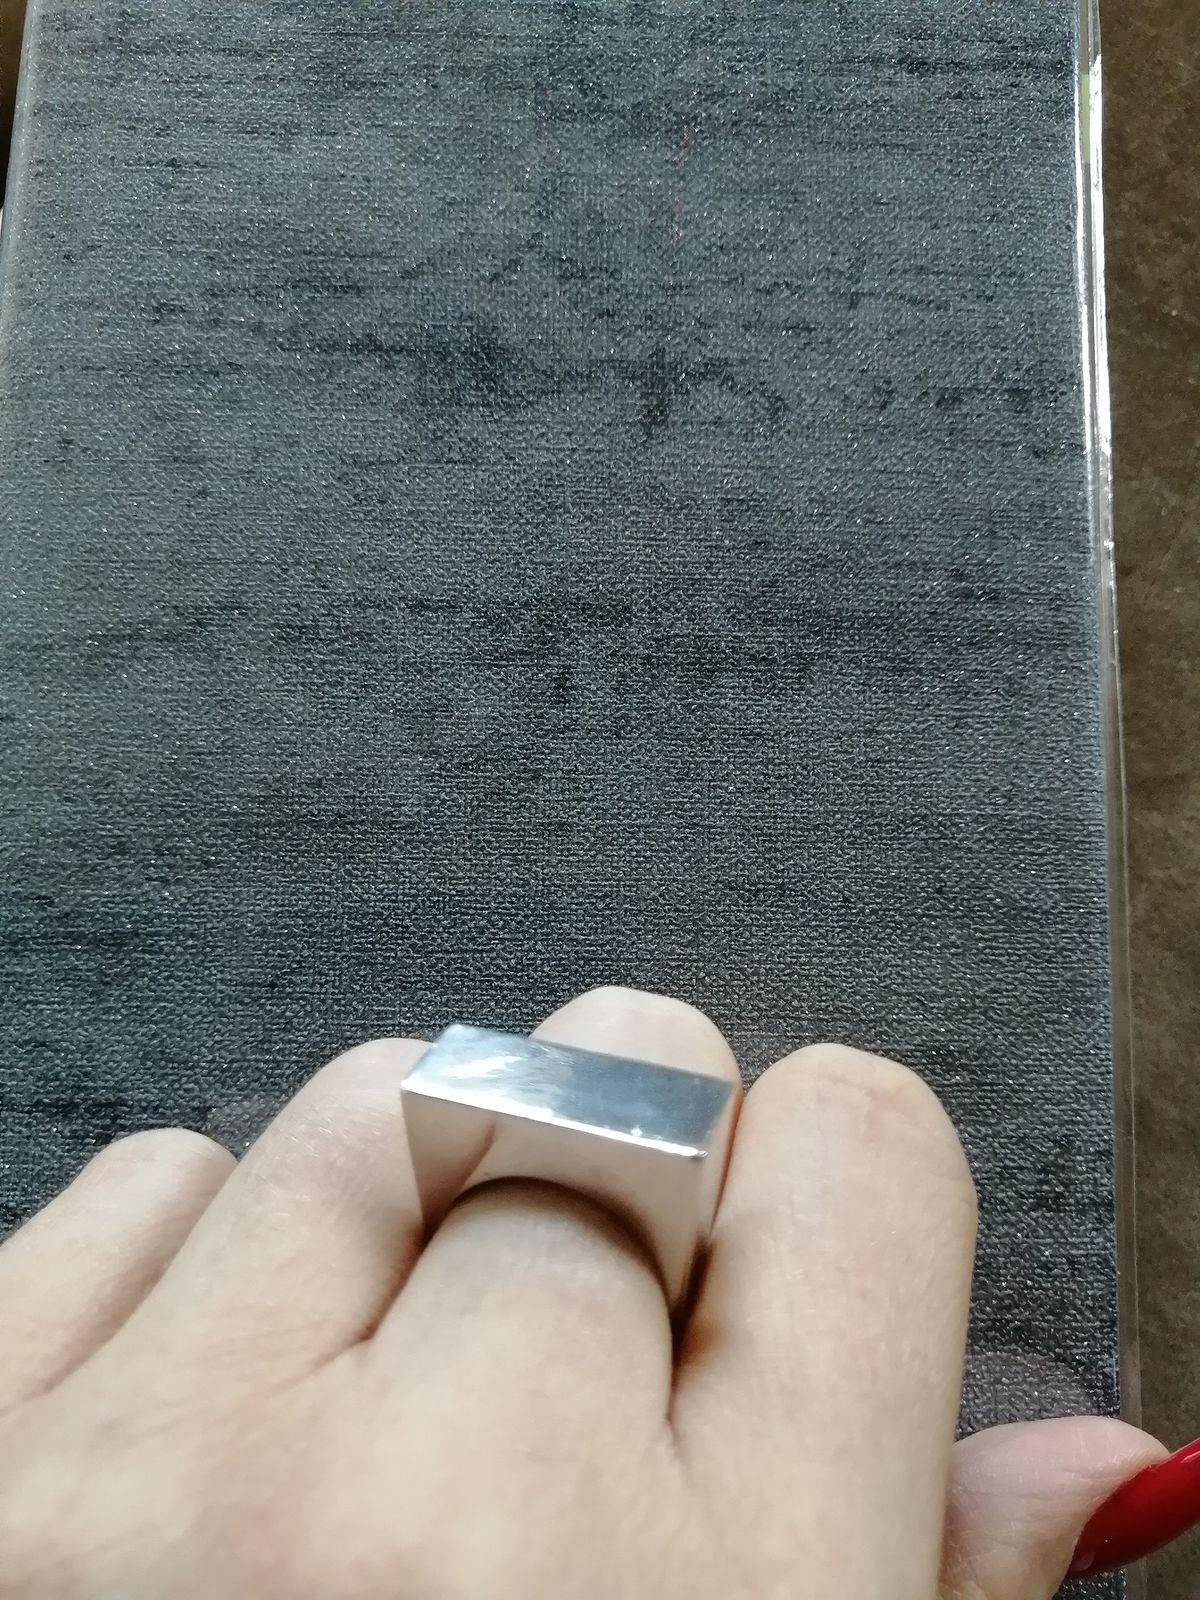 Кольцо лаконично